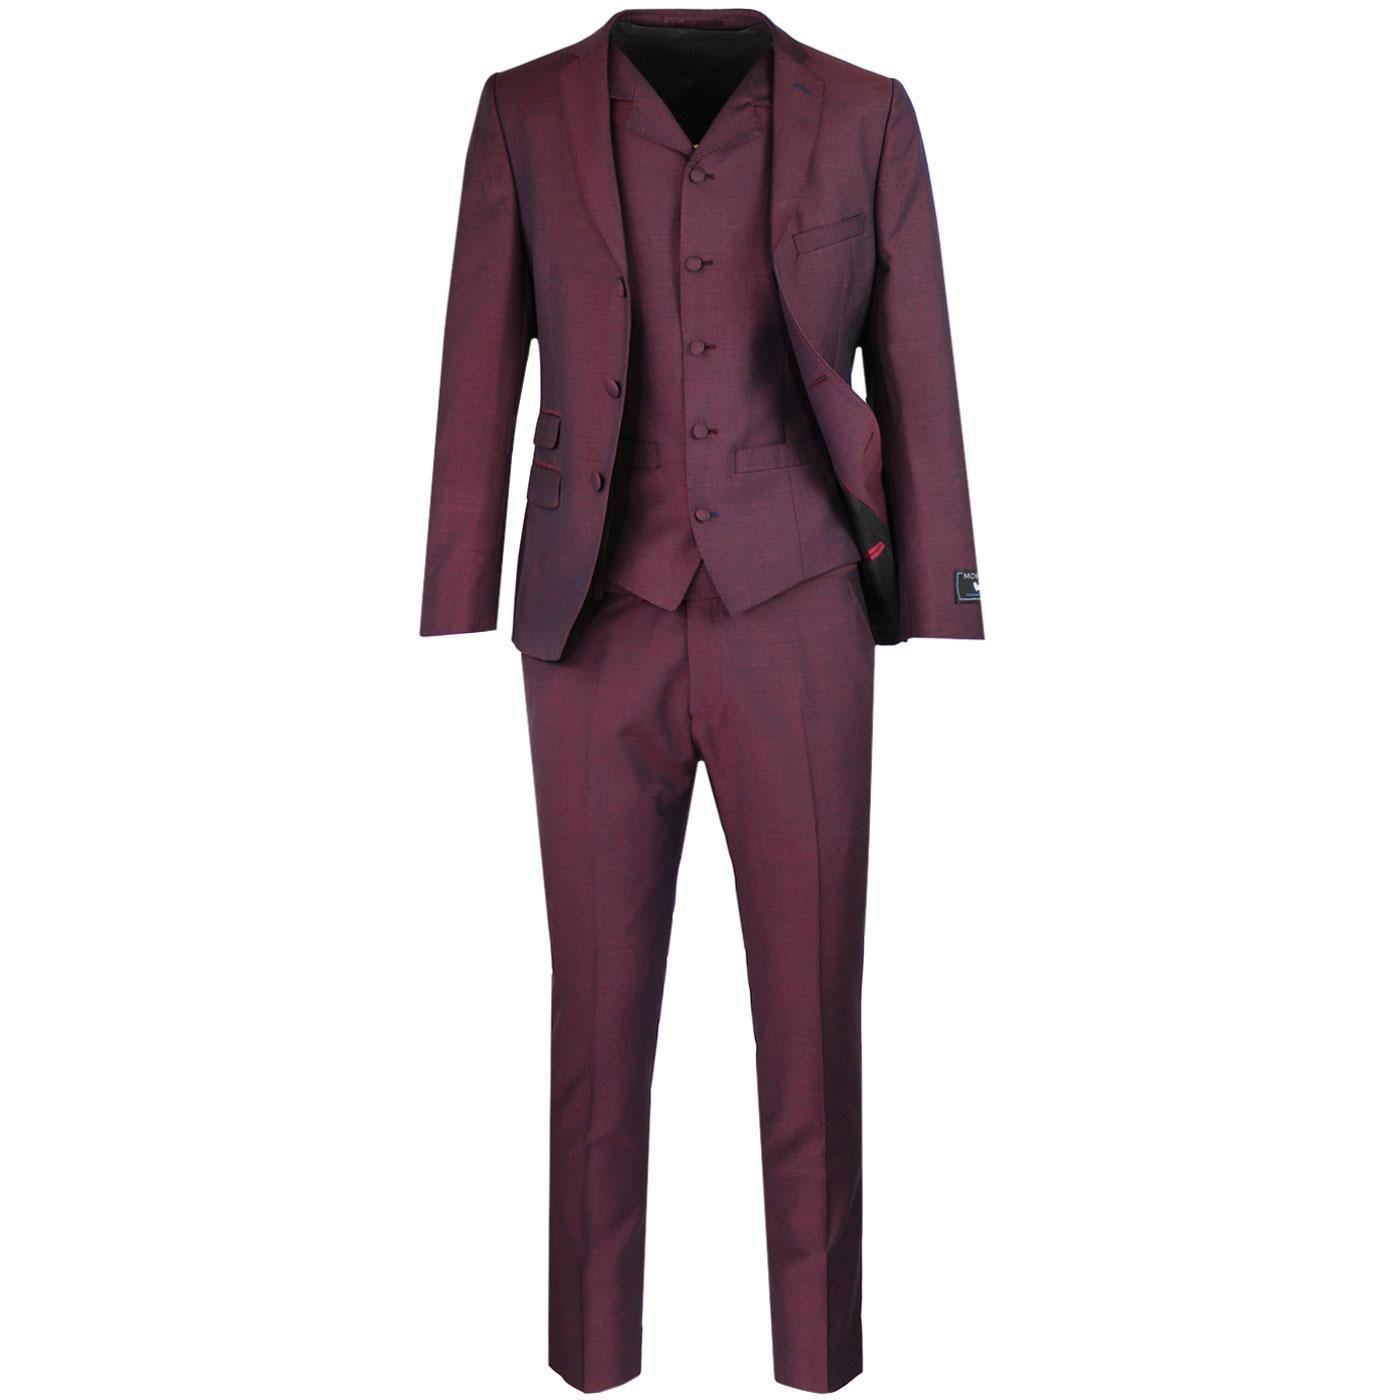 MADCAP ENGLAND 60s Mod Mohair Suit Burgundy Tonic